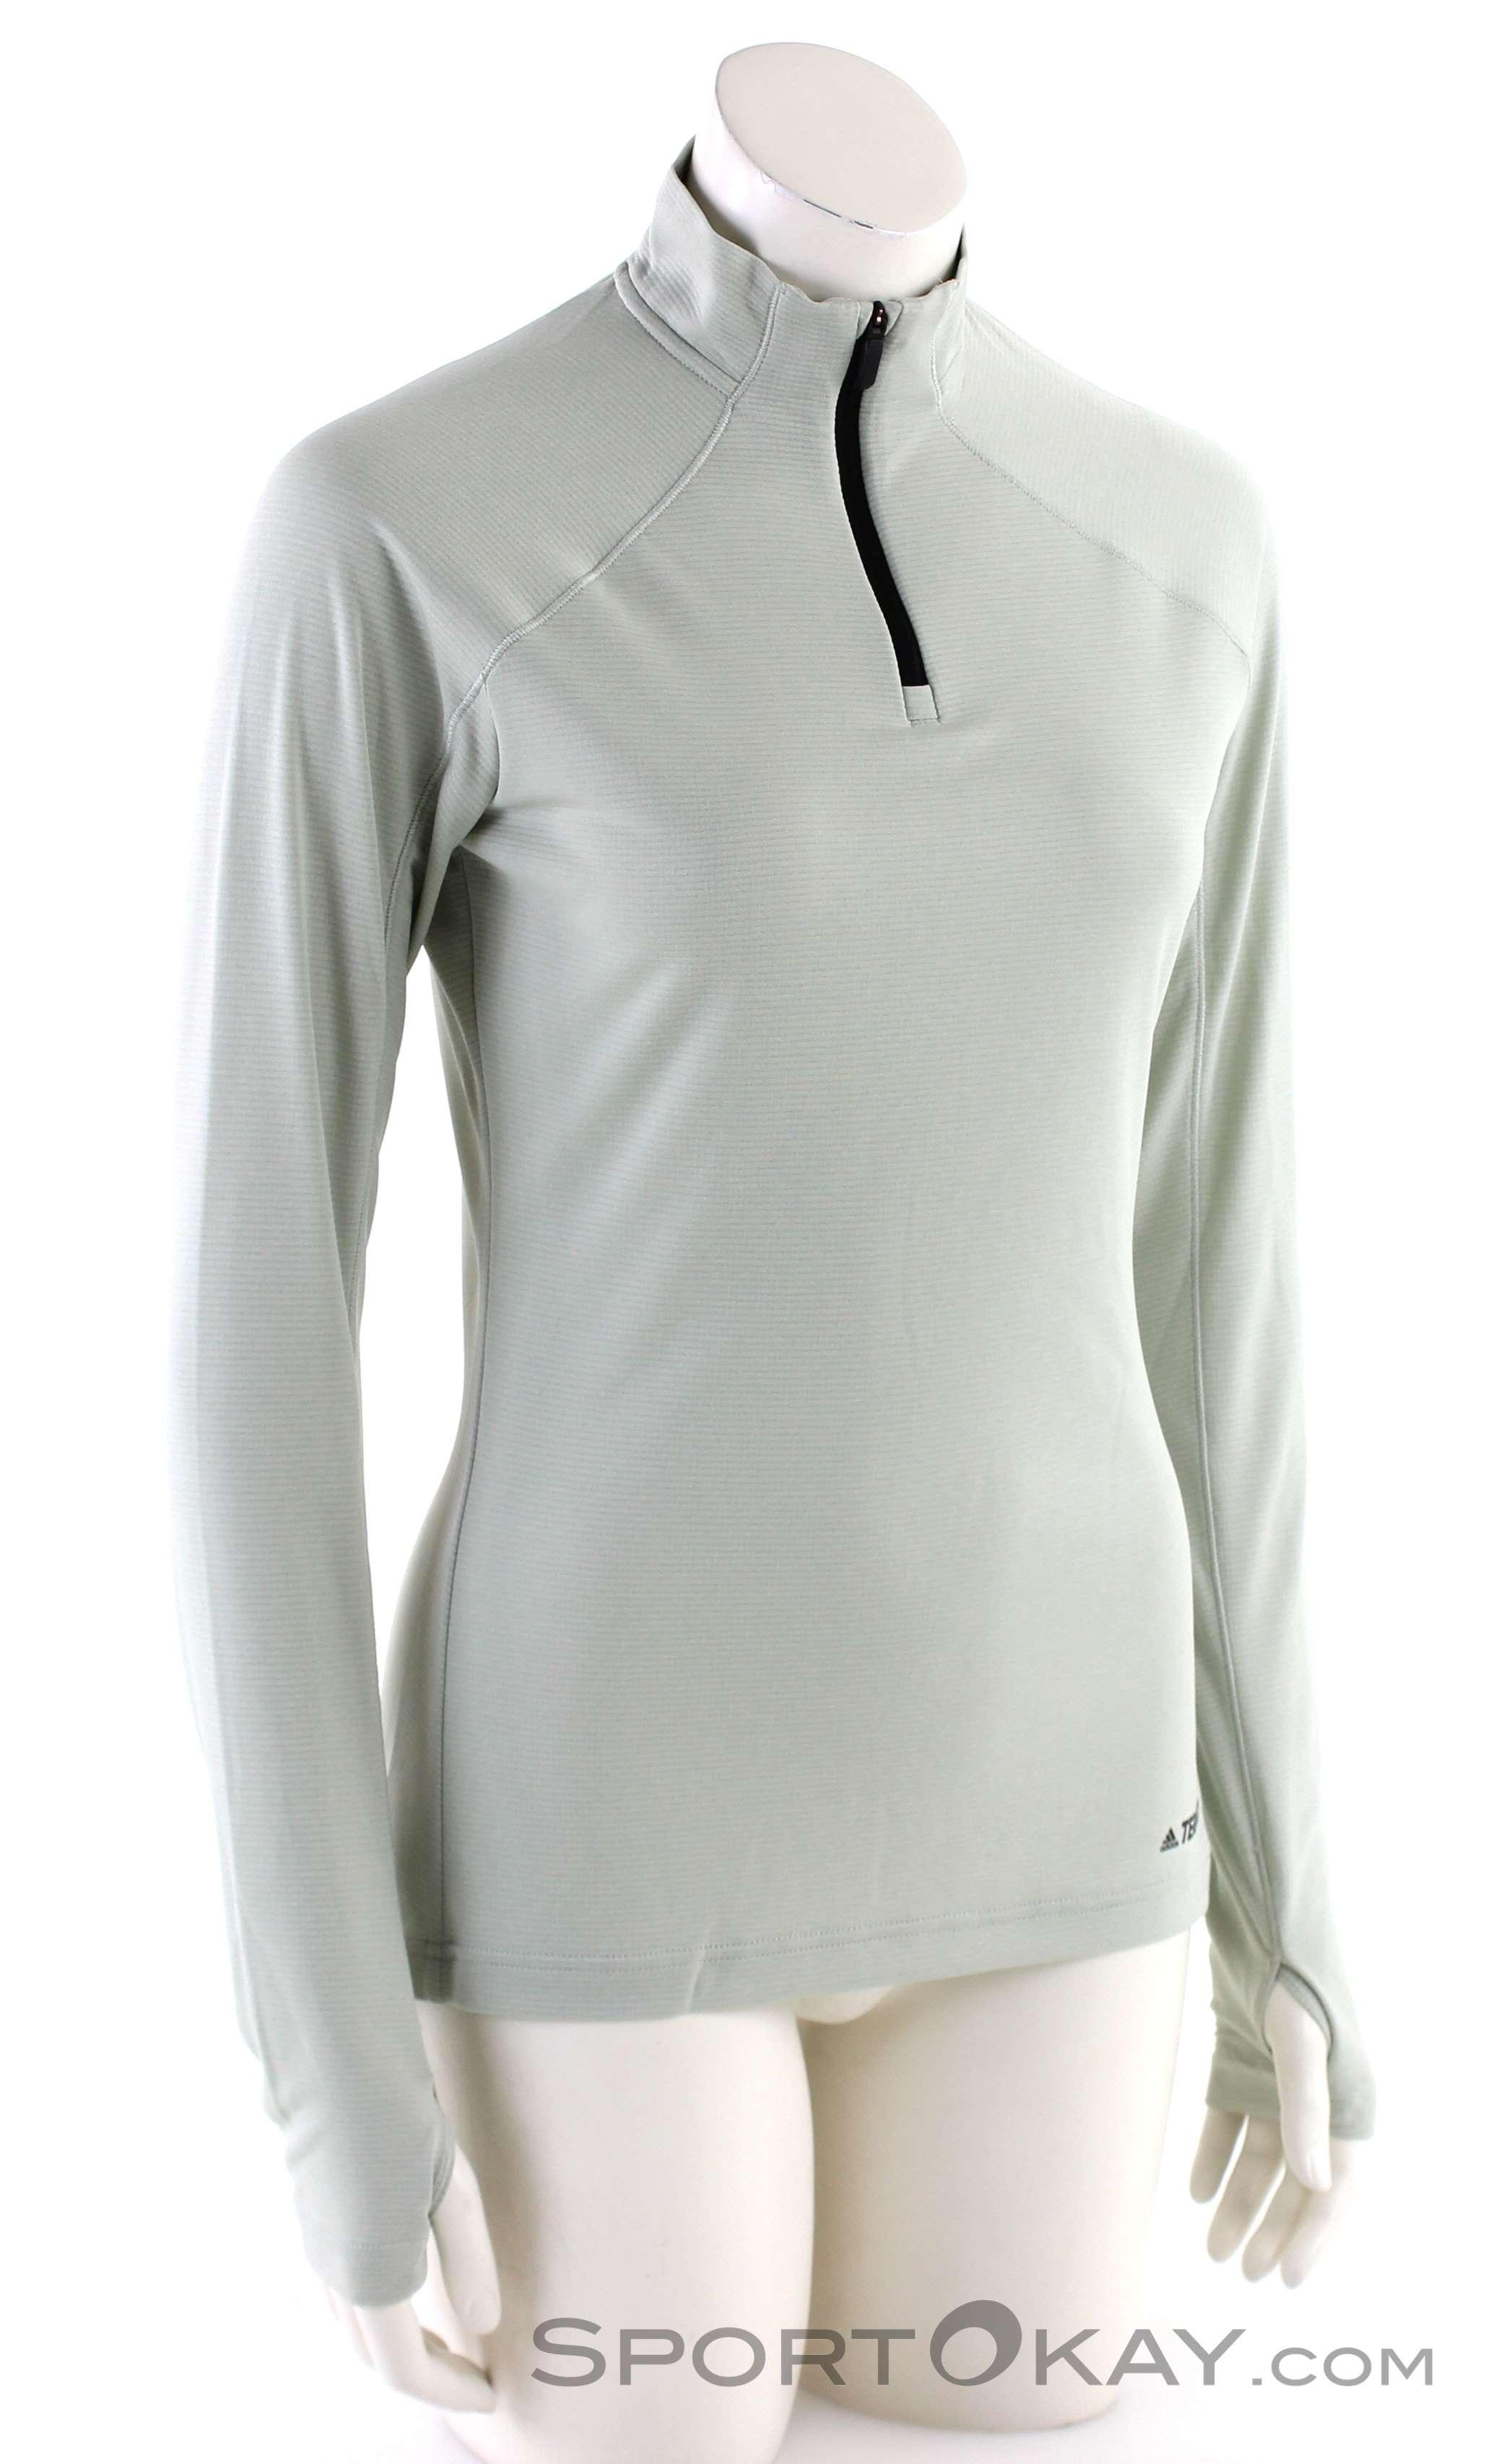 adidas Terrex Trace Ro 1/2 LS Damen Shirt-Grau-42